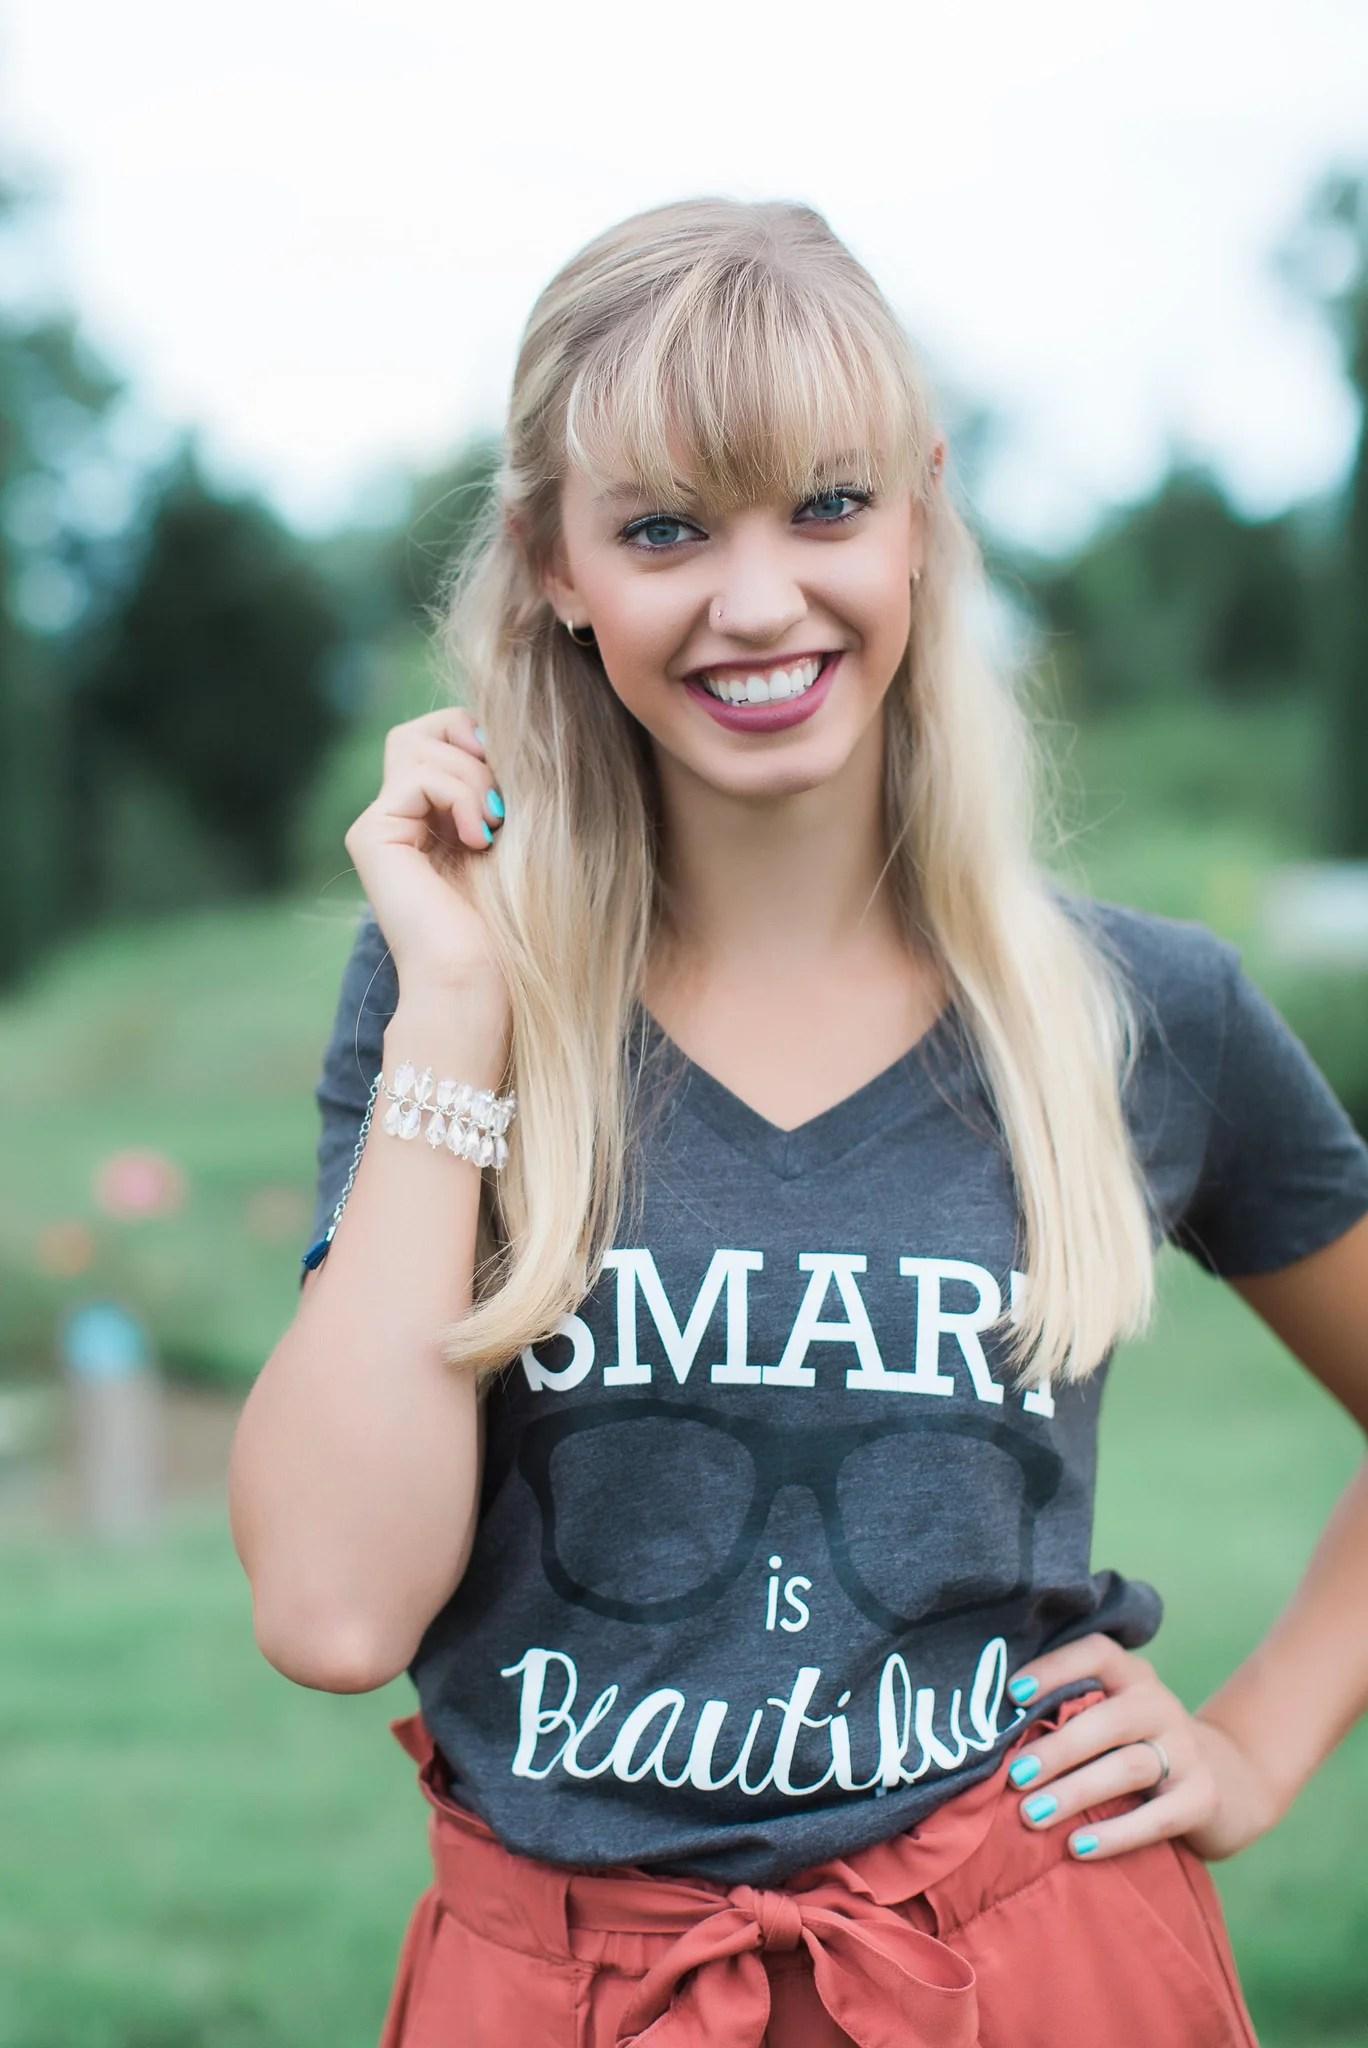 Smart Is Beautiful Nerd Girl V Neck Tee